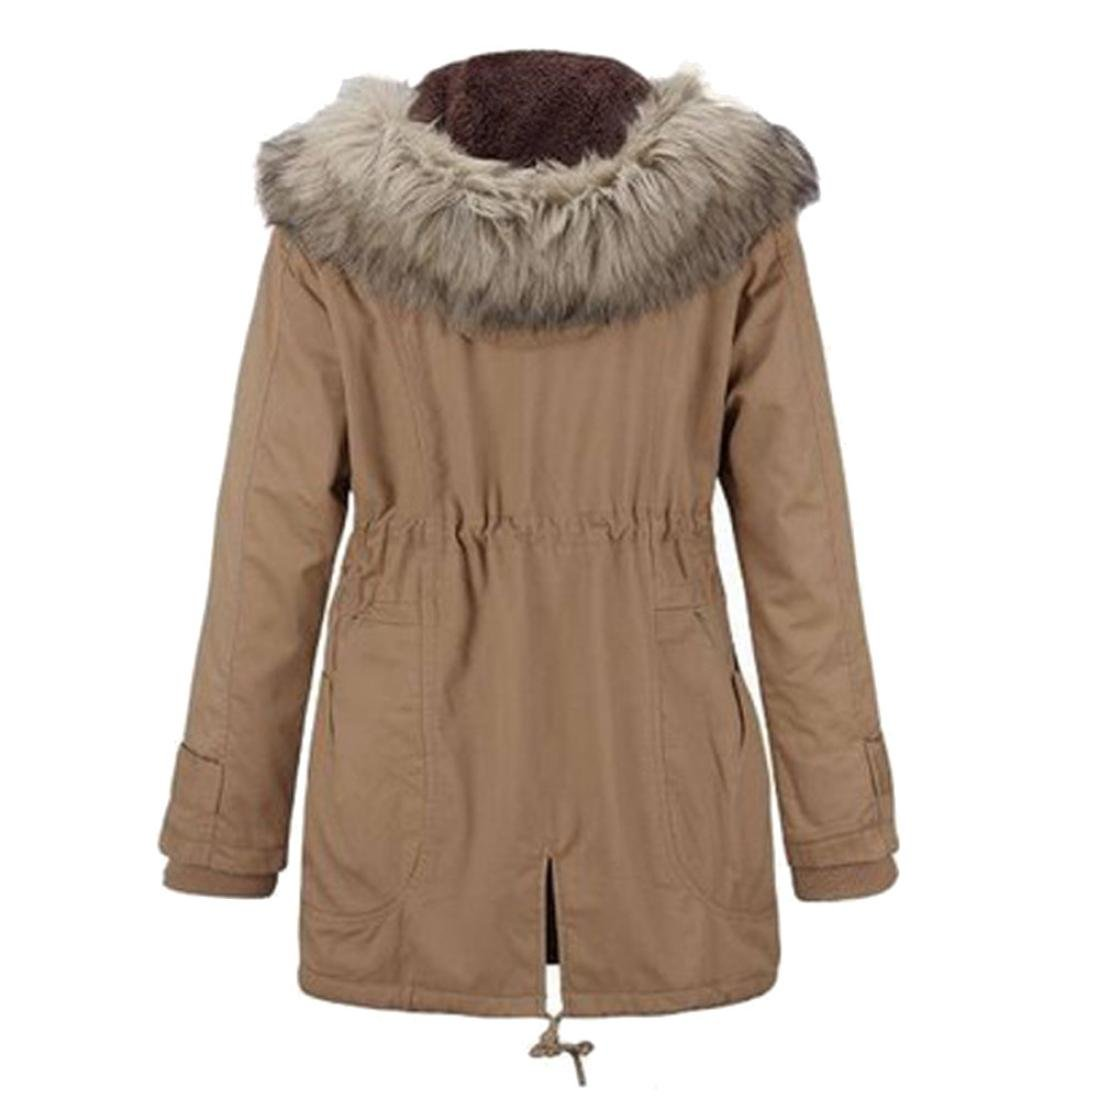 68d7620deed8 Amazon.com  Women Coat Hot Sale New Fashion Girls Christmas Warm ...